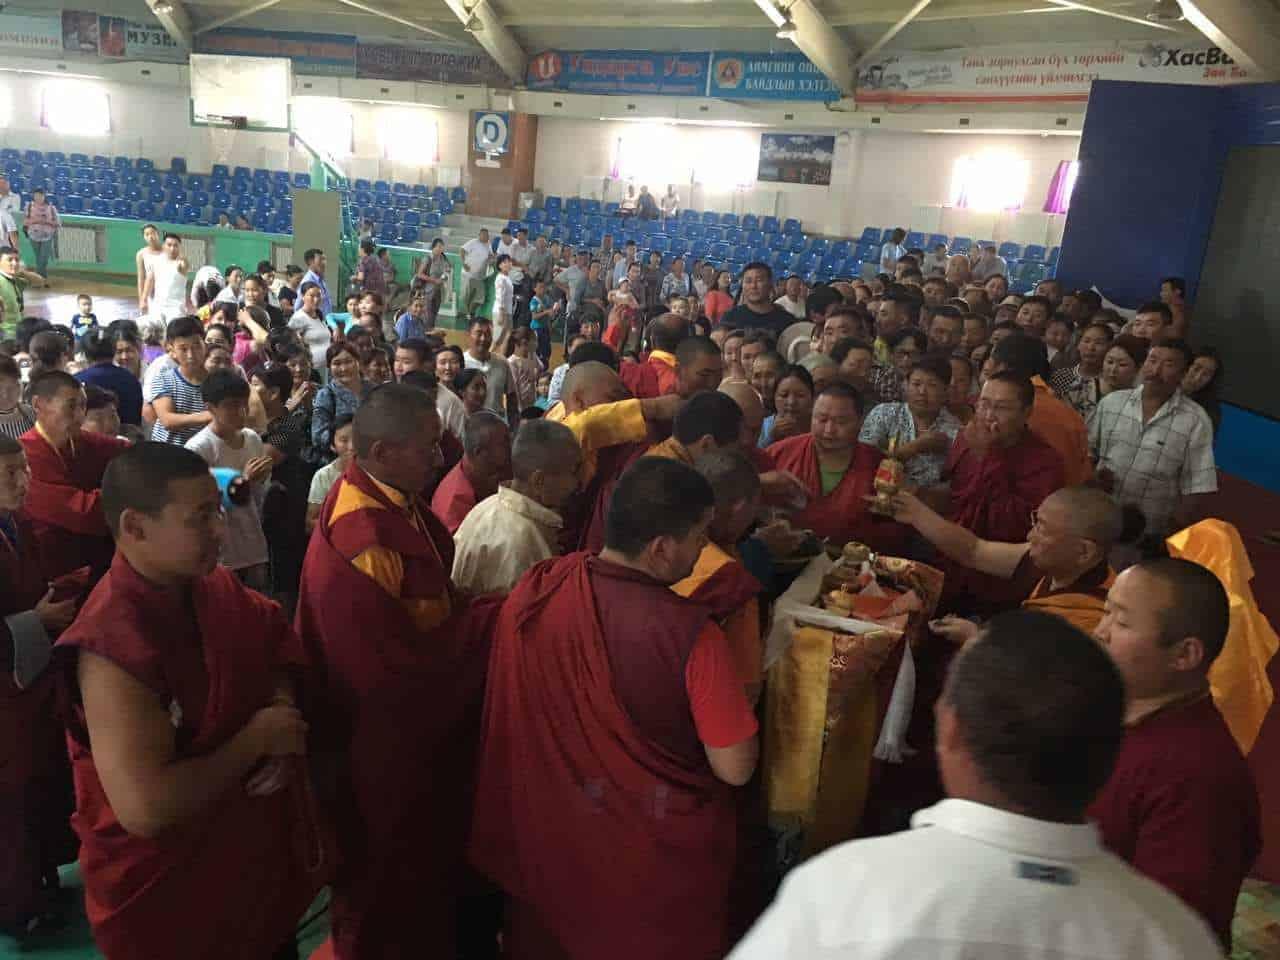 gosok-rinpoche-mongolia-2016-1bd2467c57de7c4cc1bf86dc25fa6d7